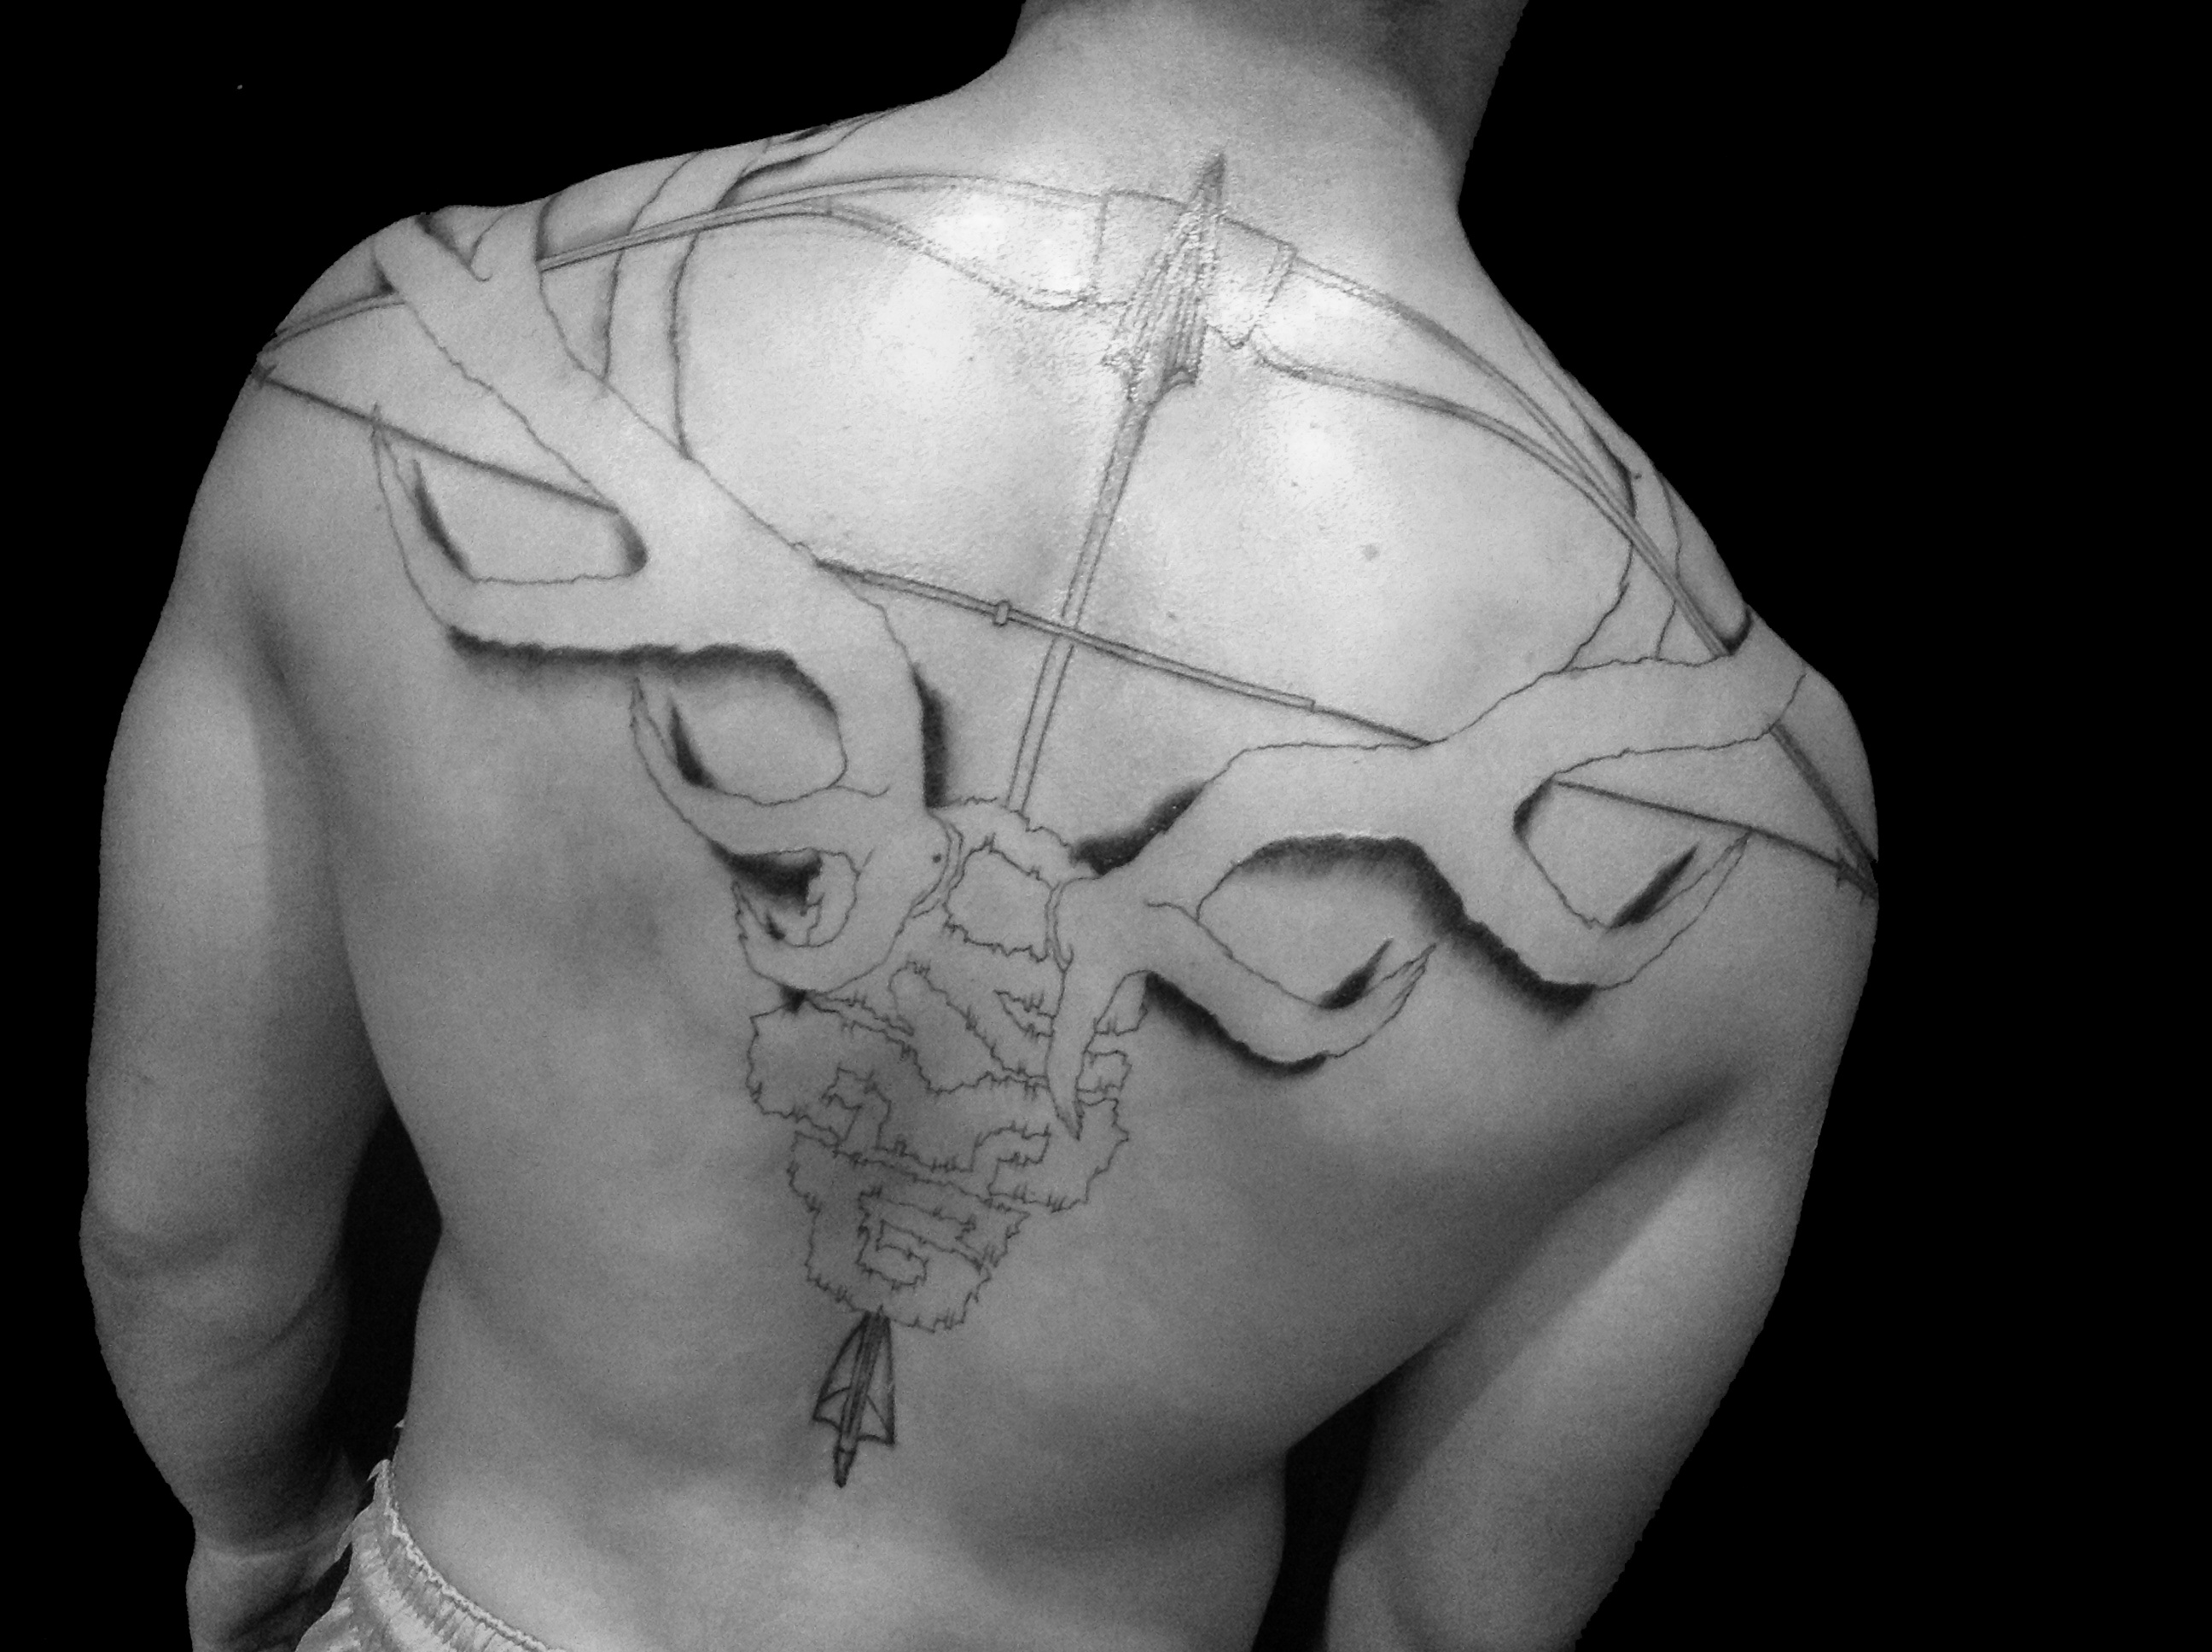 Bow and arrow tattoos